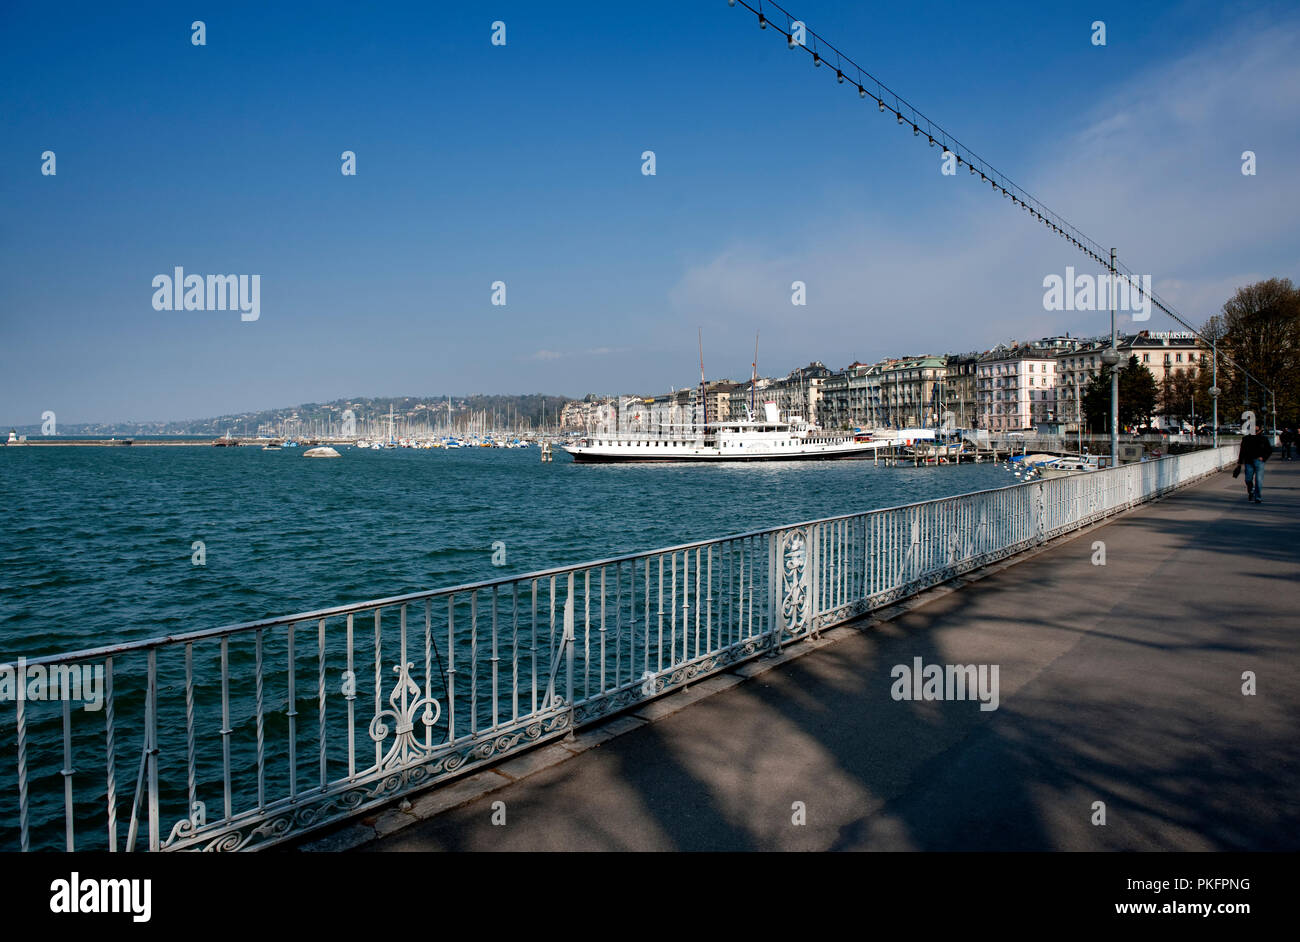 The Promenadu du Lac along the Leman lake in Geneva (Switzerland, 16/04/2010) - Stock Image